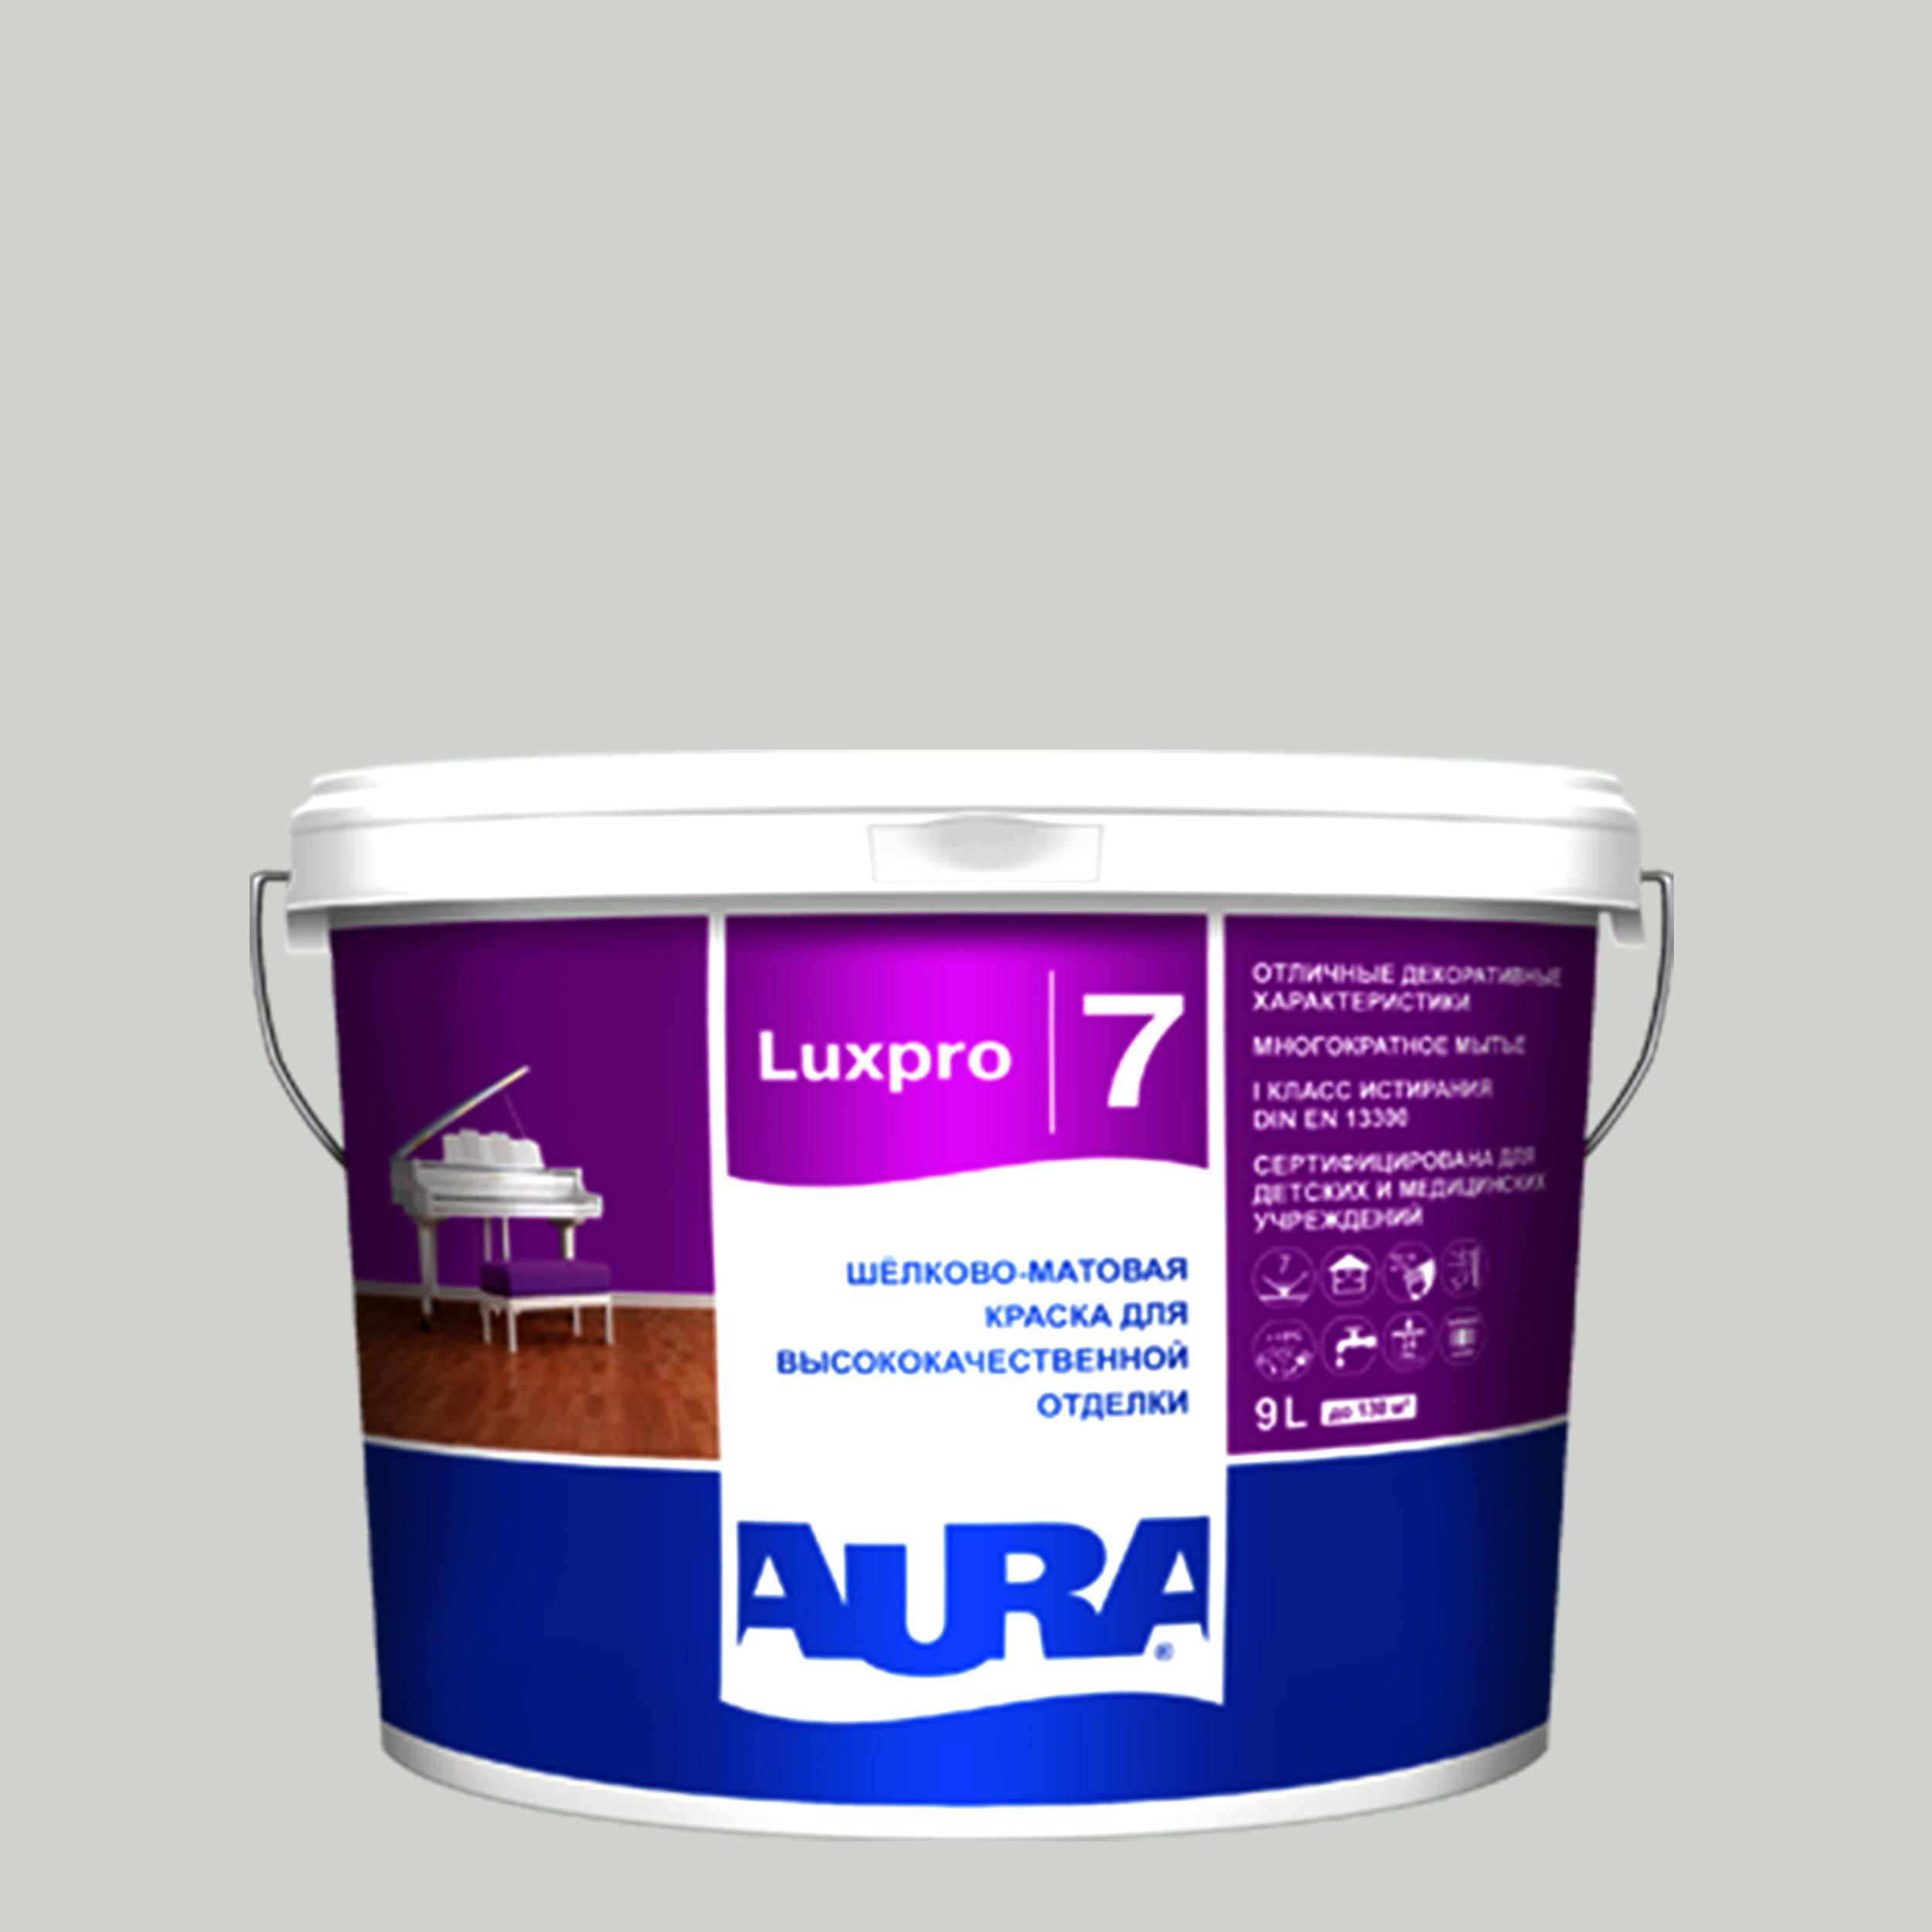 Фото 4 - Краска интерьерная, Aura LuxPRO 7, RAL 5020, 11 кг.